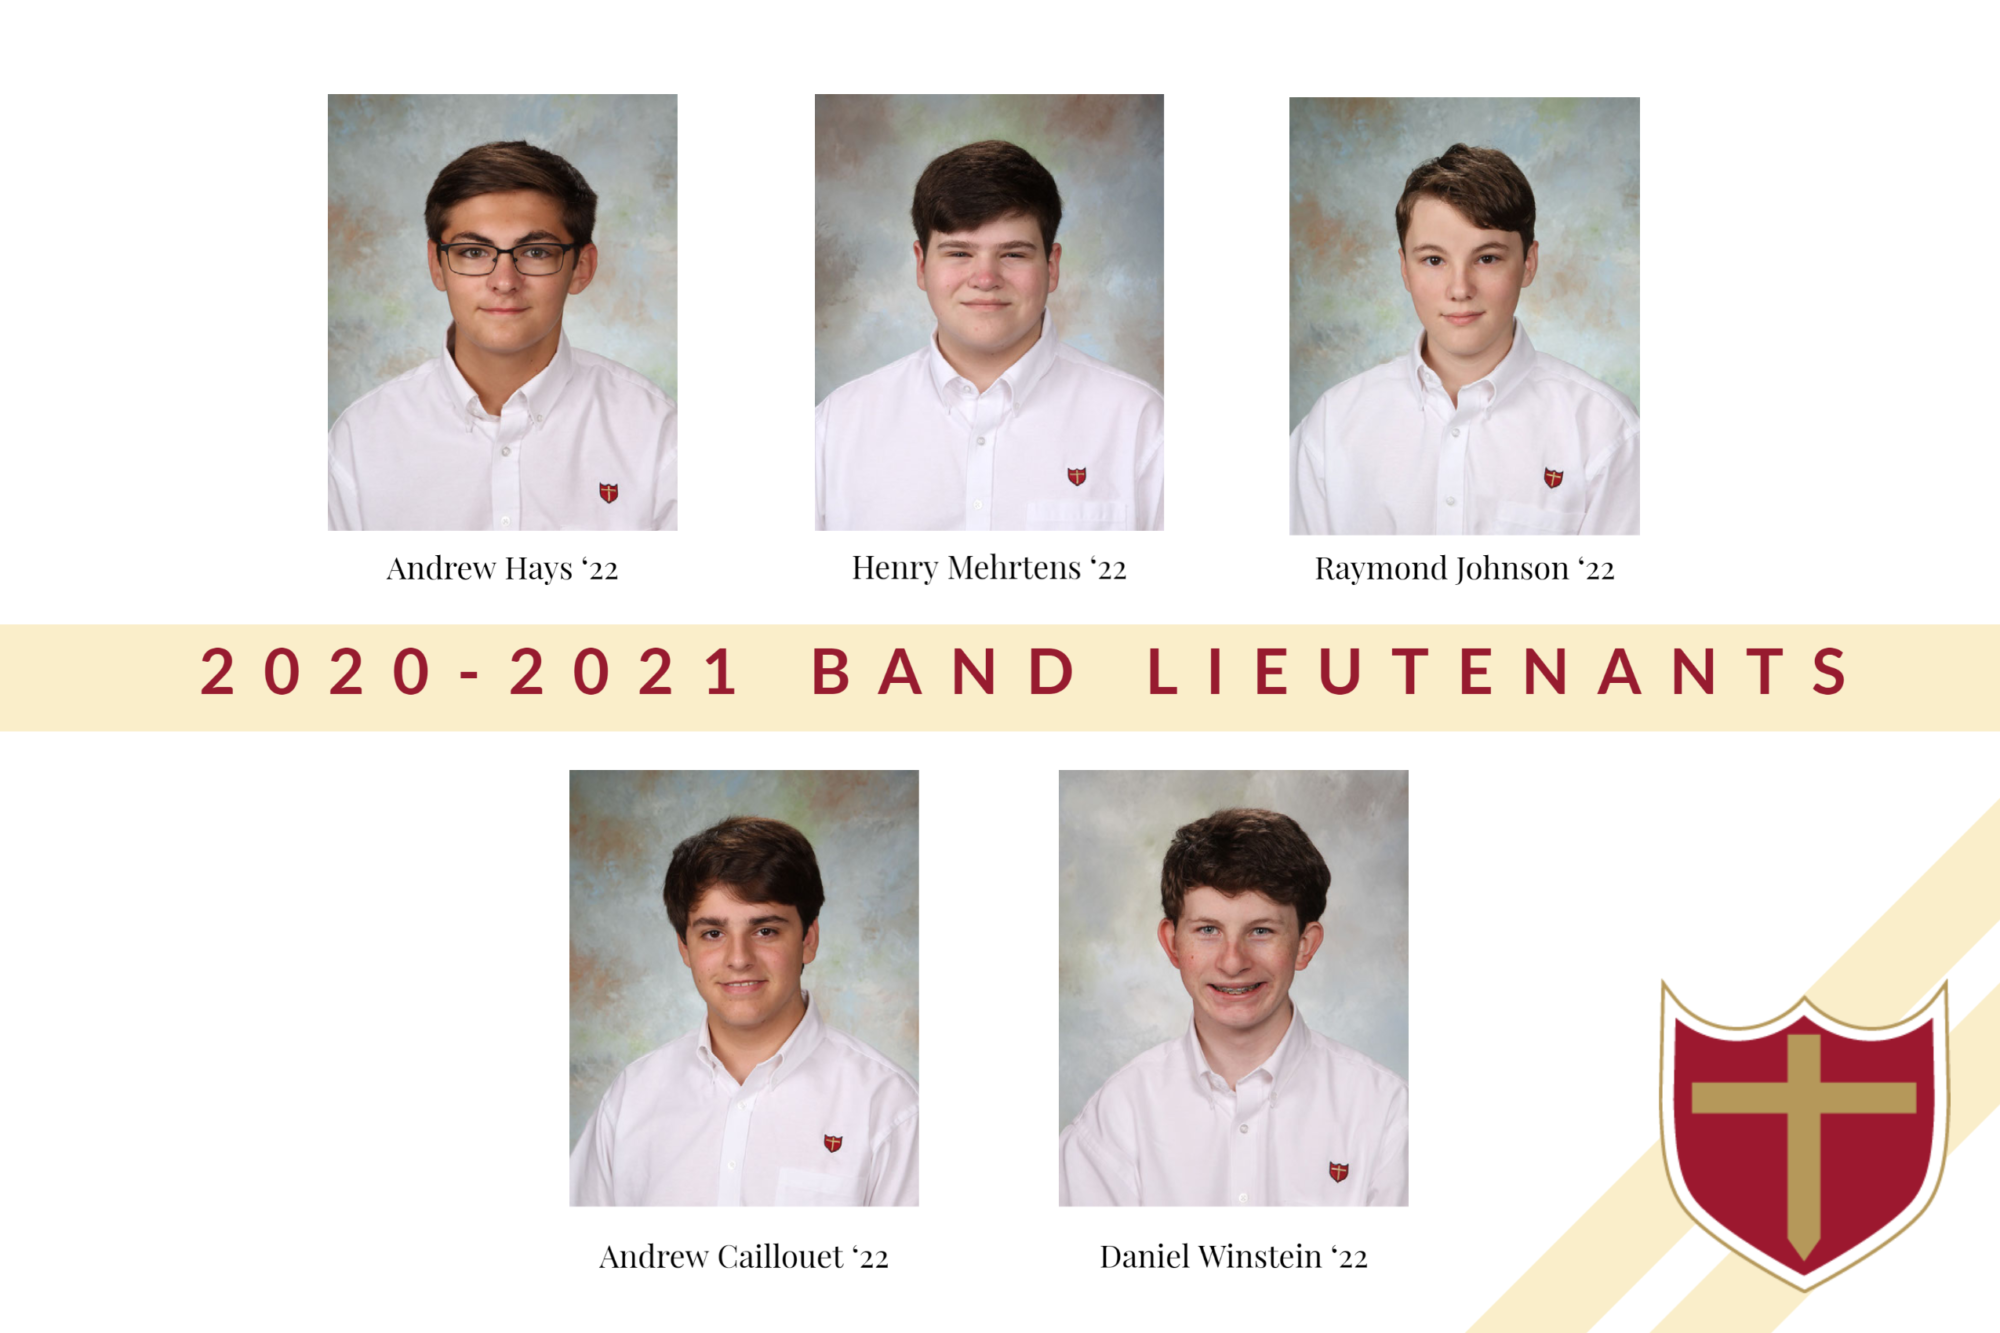 21-22 Band Lieutenants